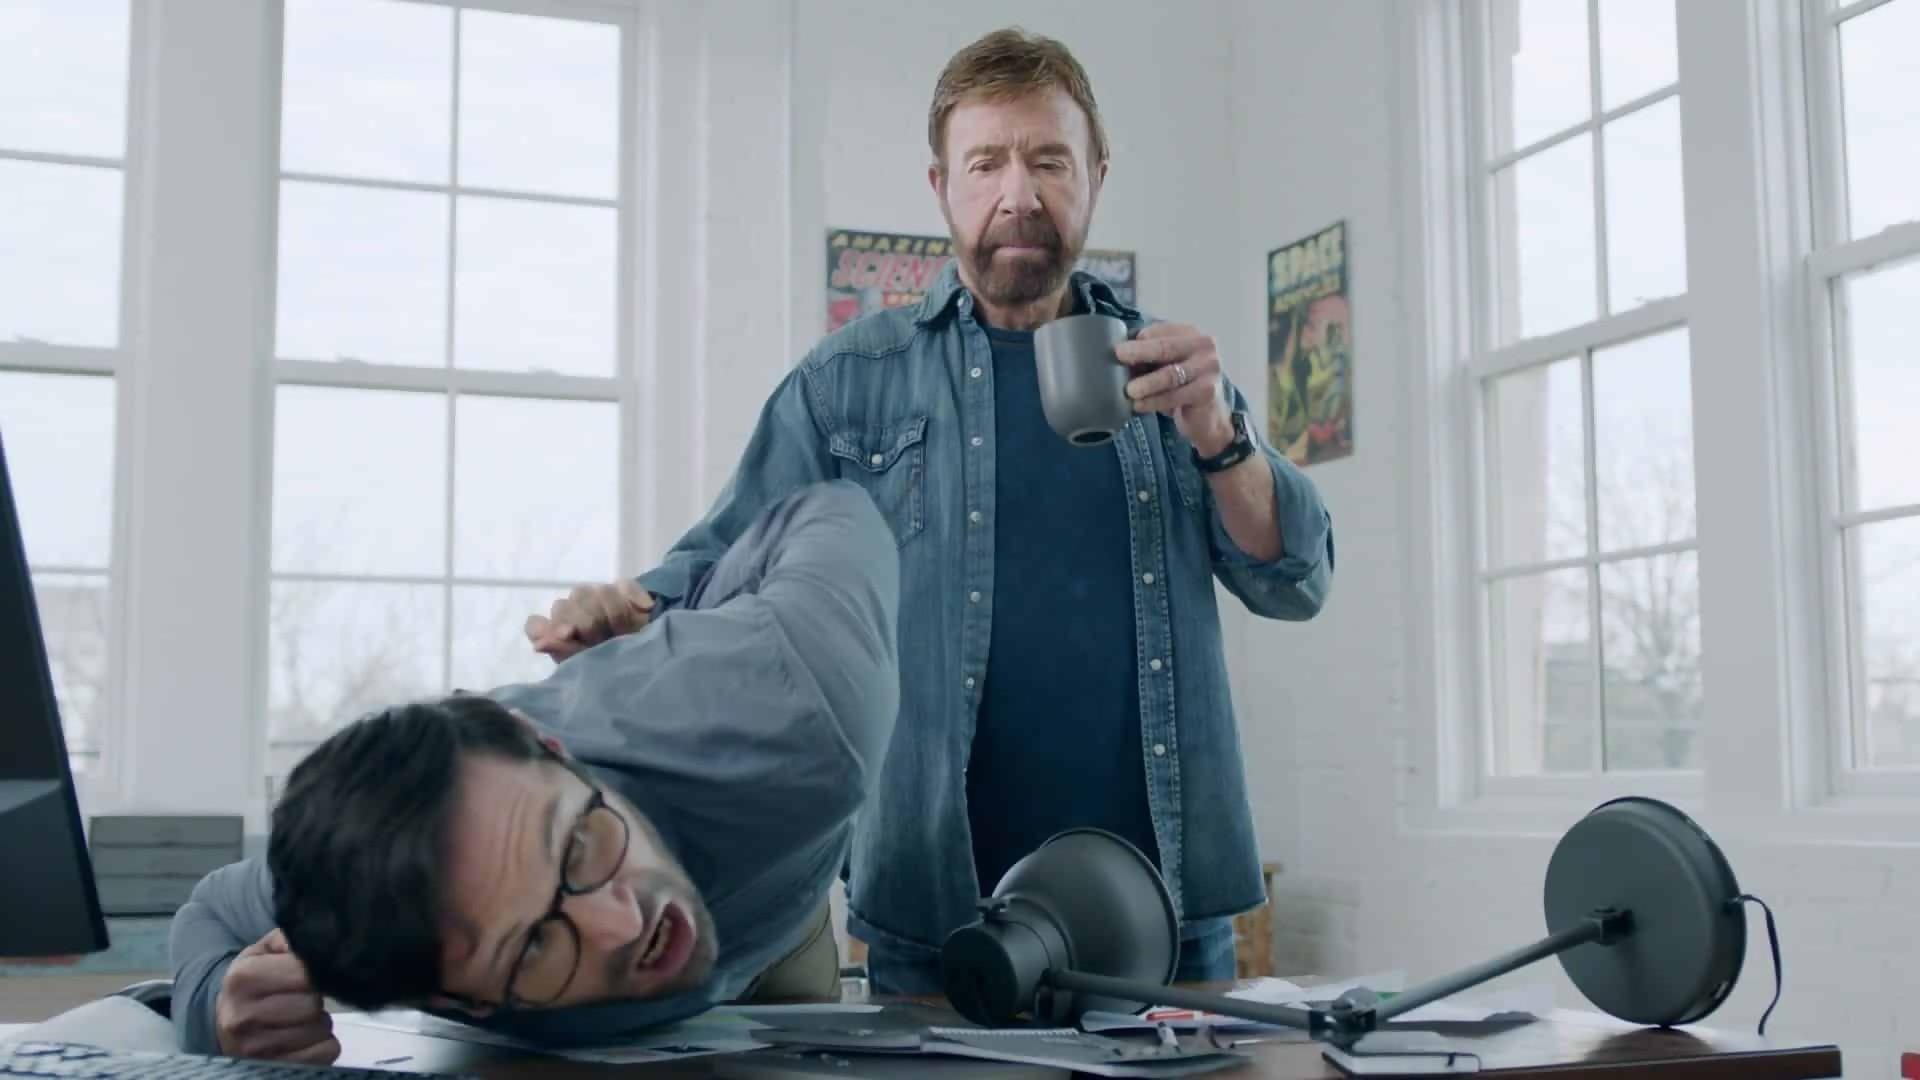 Jeu vidéo. Chuck Norris a son propre jeu mobile